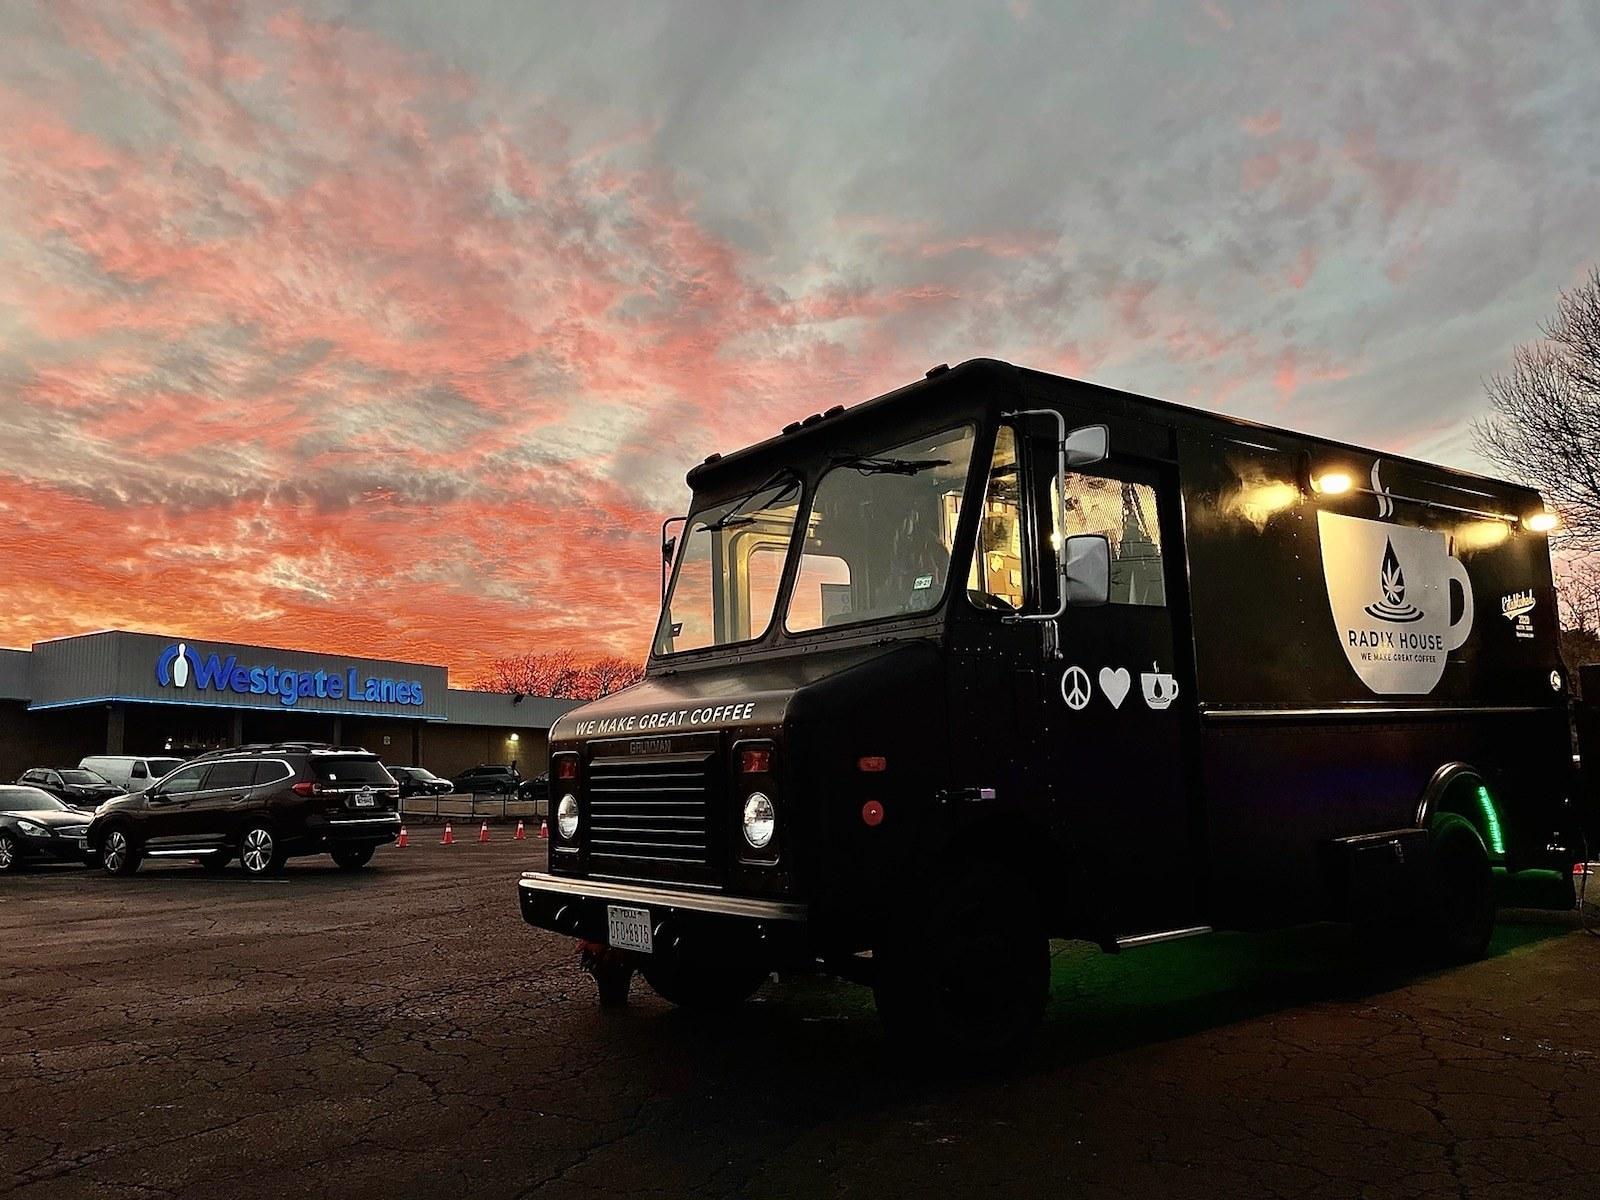 Radix House Coffee truck against skyline